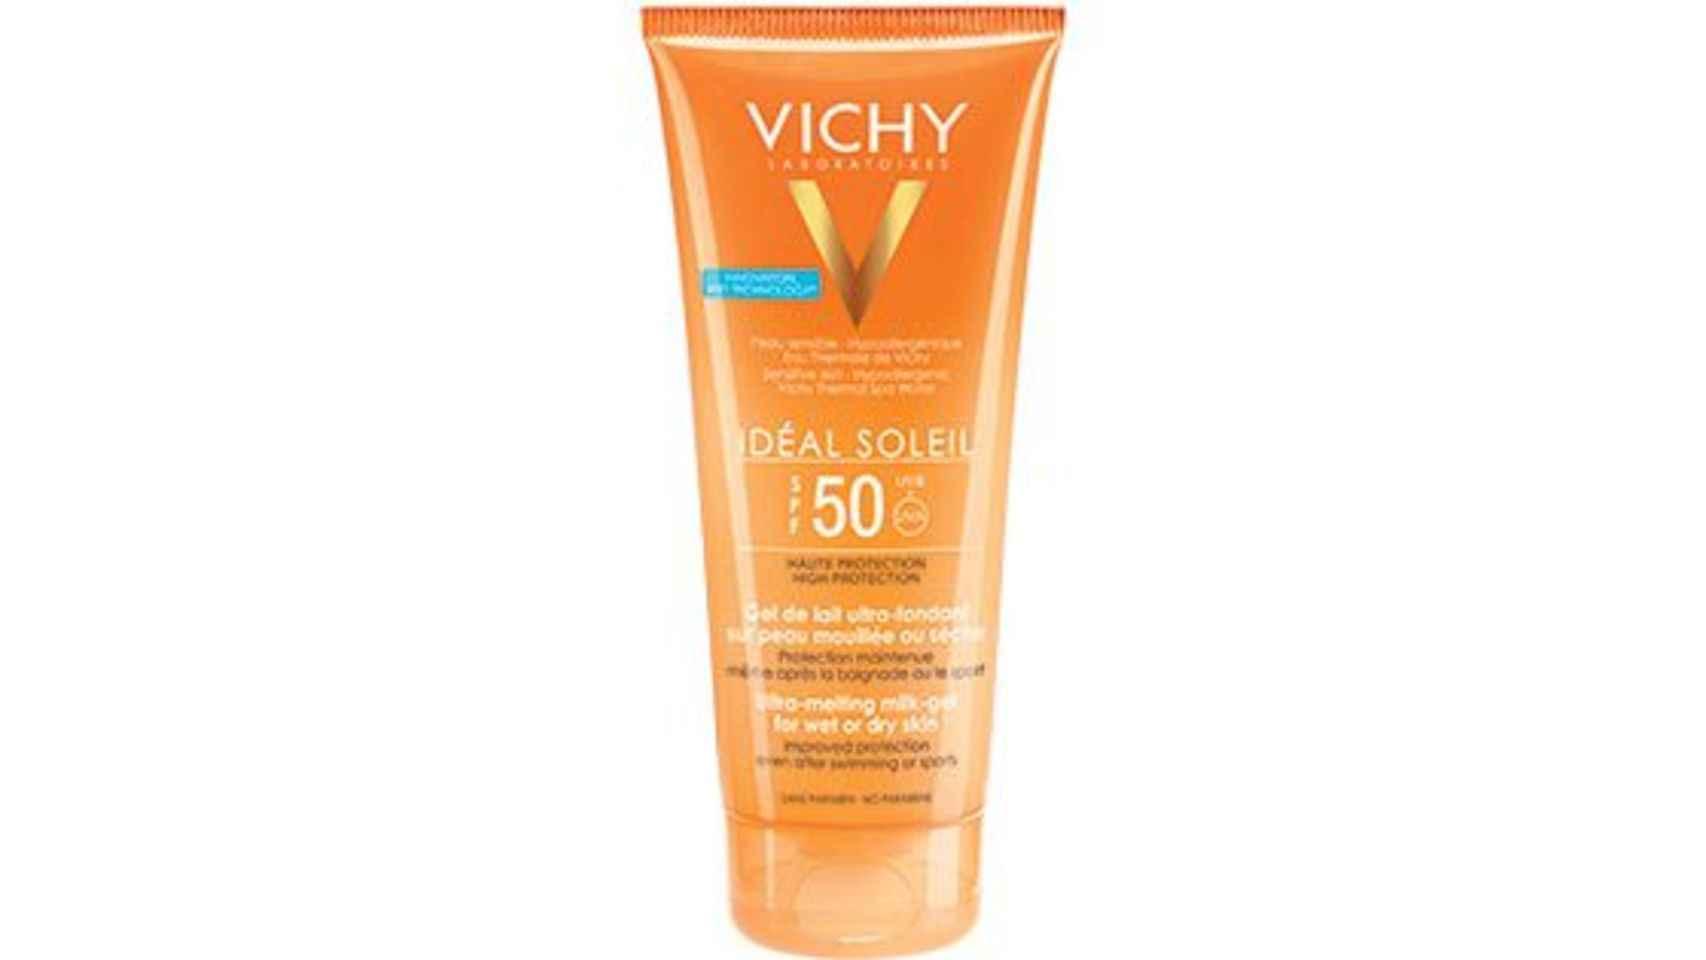 Gel ultra fundente SPF 50 para aplicar sobre piel seca o mojada de Vichy.